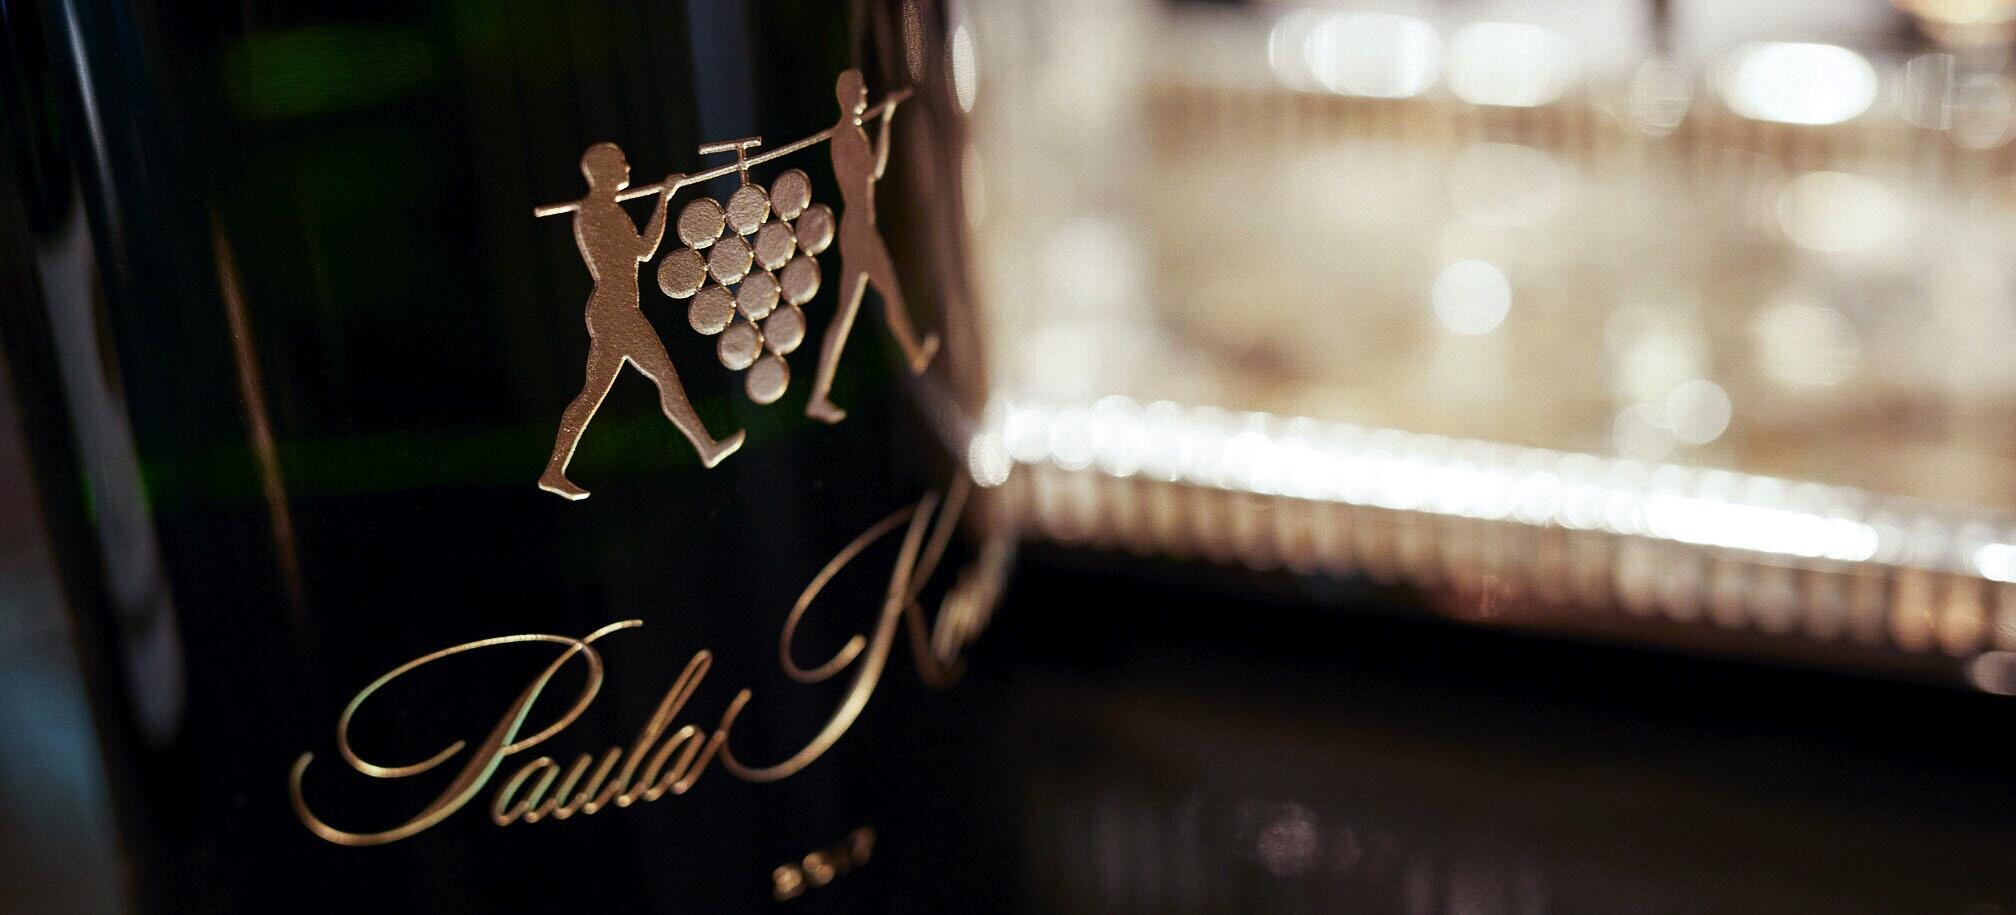 Paula Kornell Sparkling Wine Cover Image